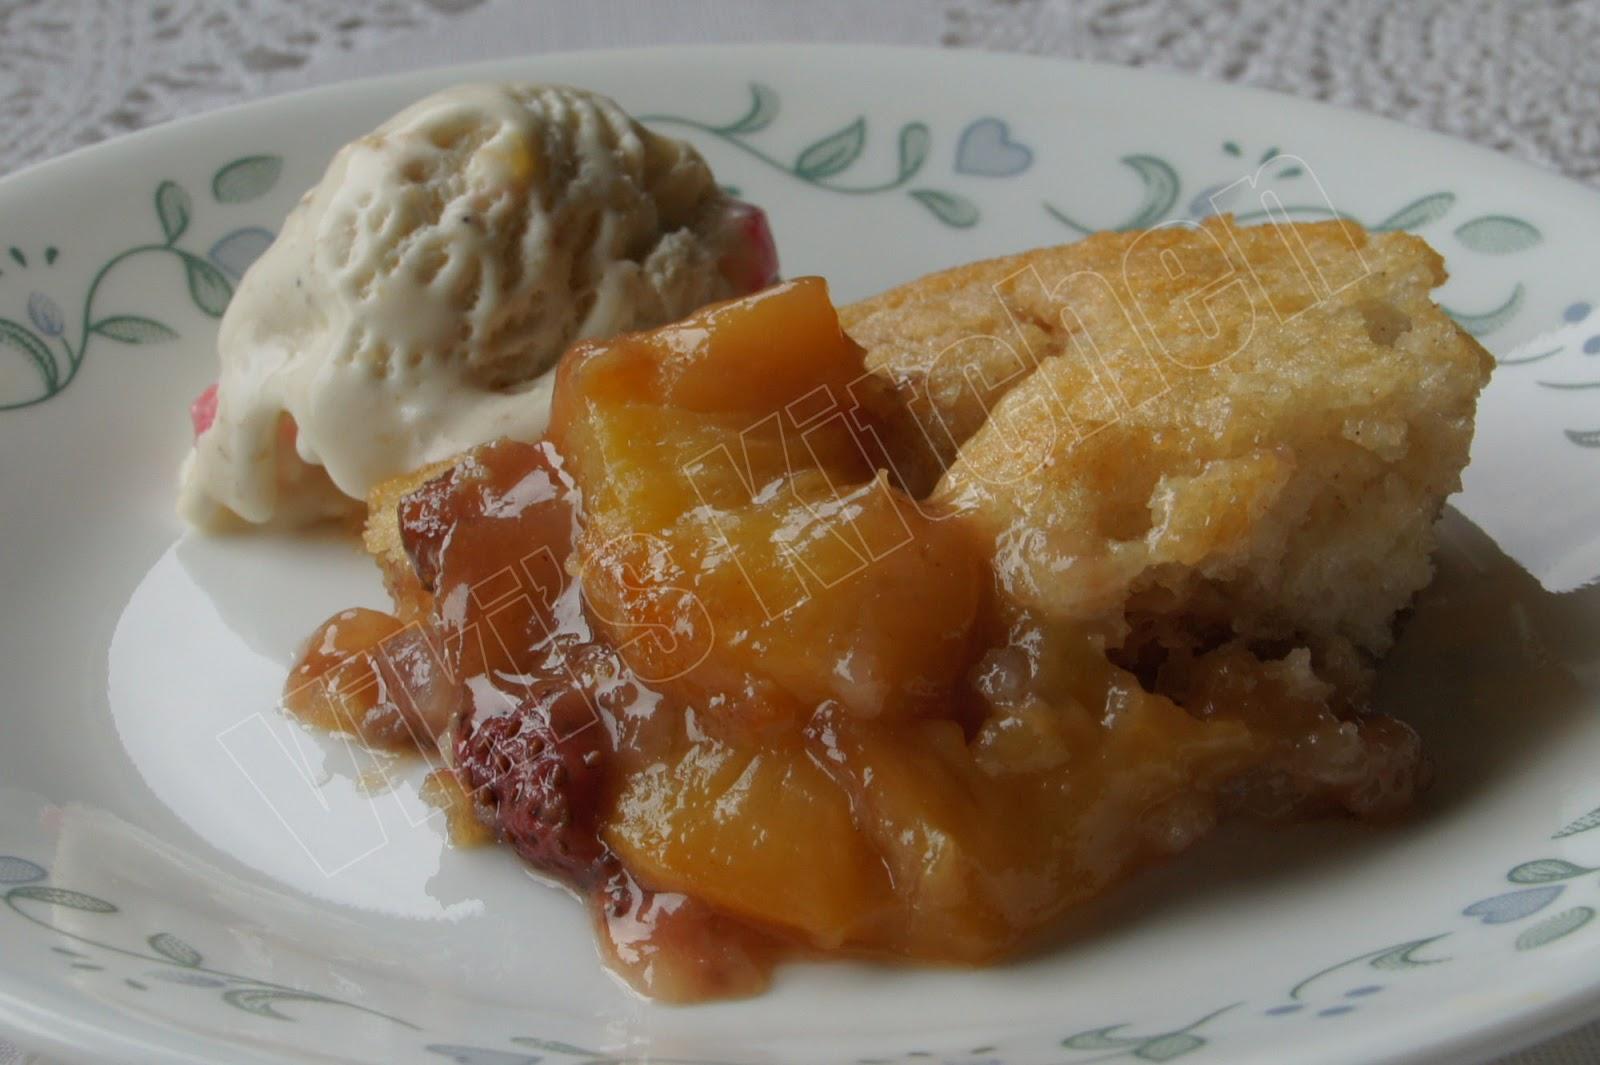 Peach cobbler with almond kulfi ice cream